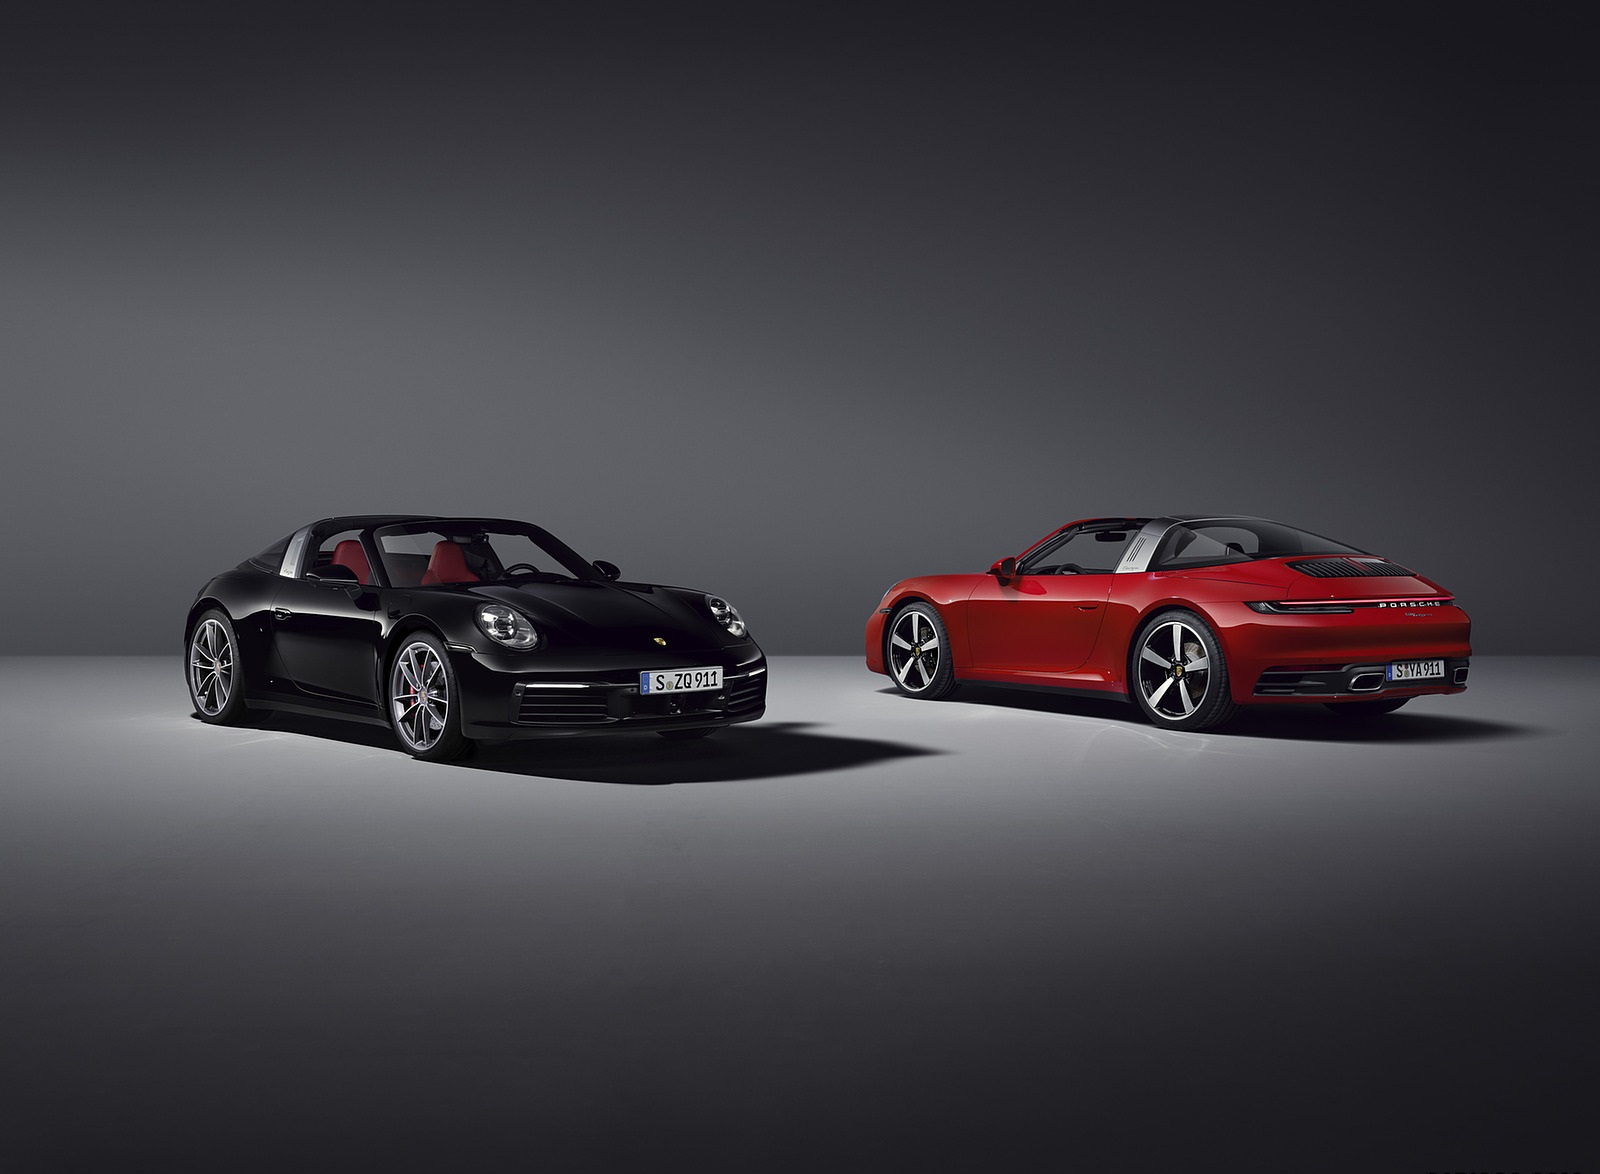 2021 Porsche 911 Targa 4S and Targa 4 Wallpapers (8)